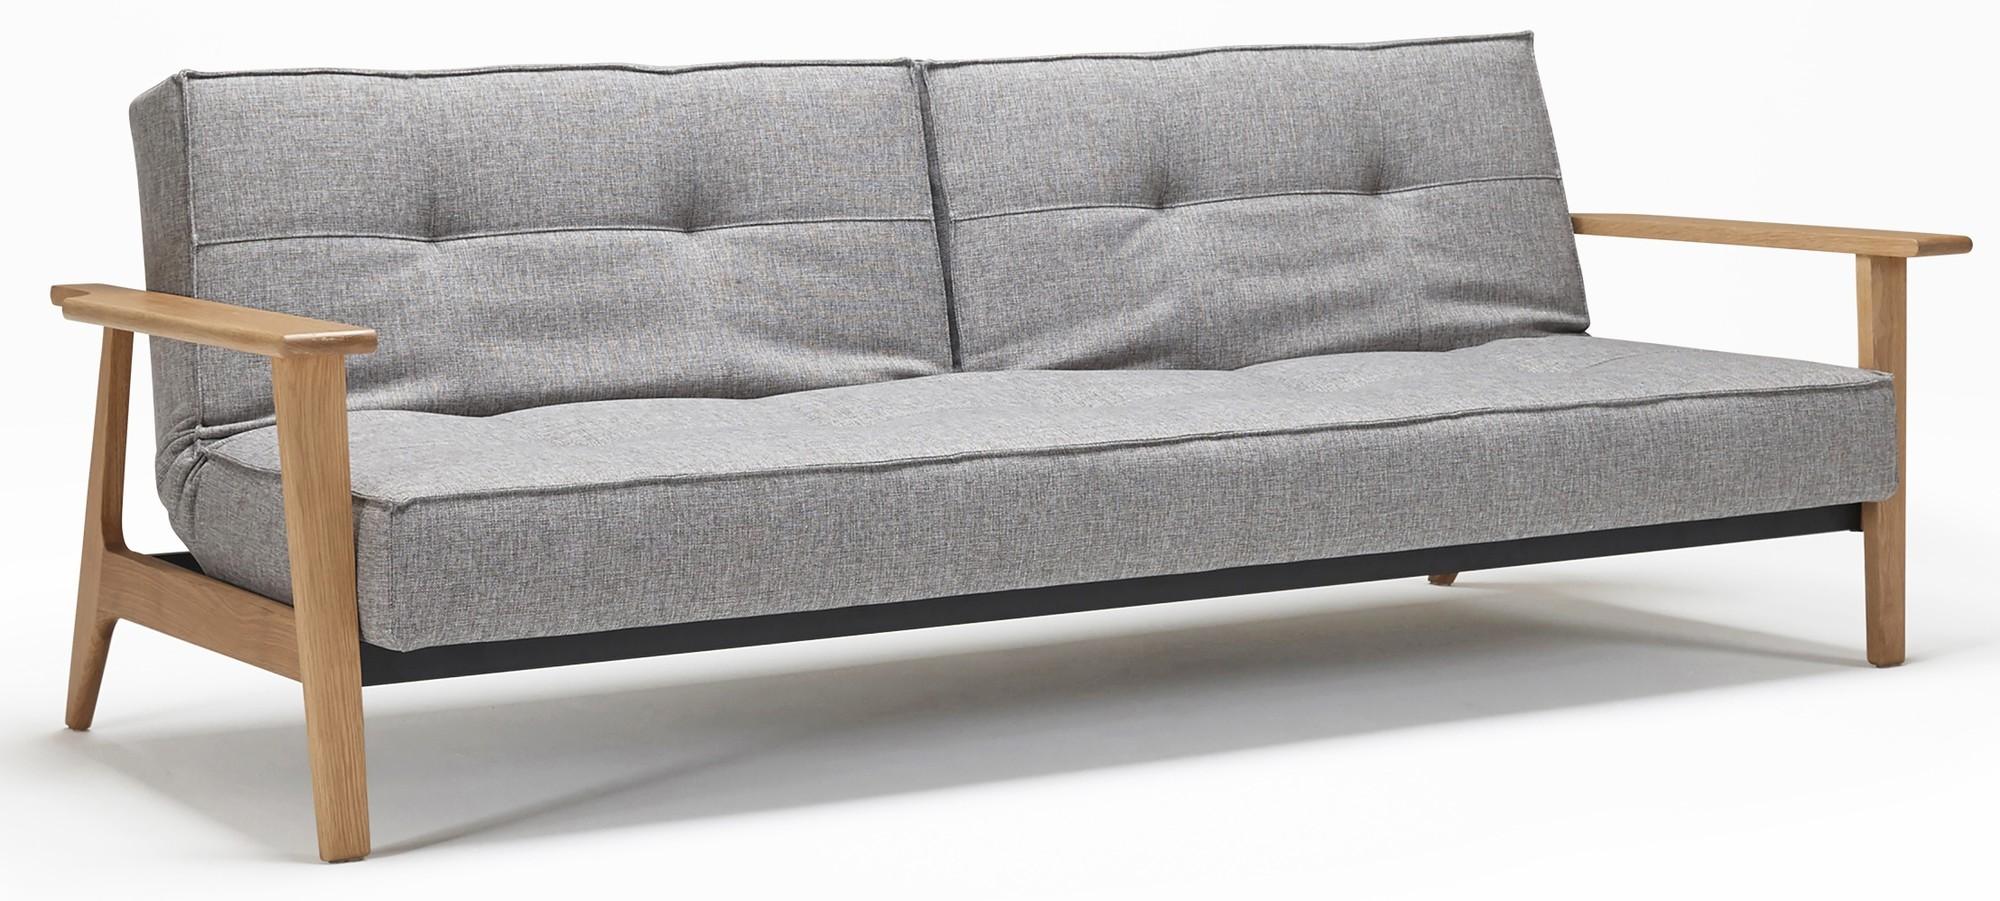 innovation slaapbank splitback frej mixed dance 521 grijs aanbieding designonline24. Black Bedroom Furniture Sets. Home Design Ideas